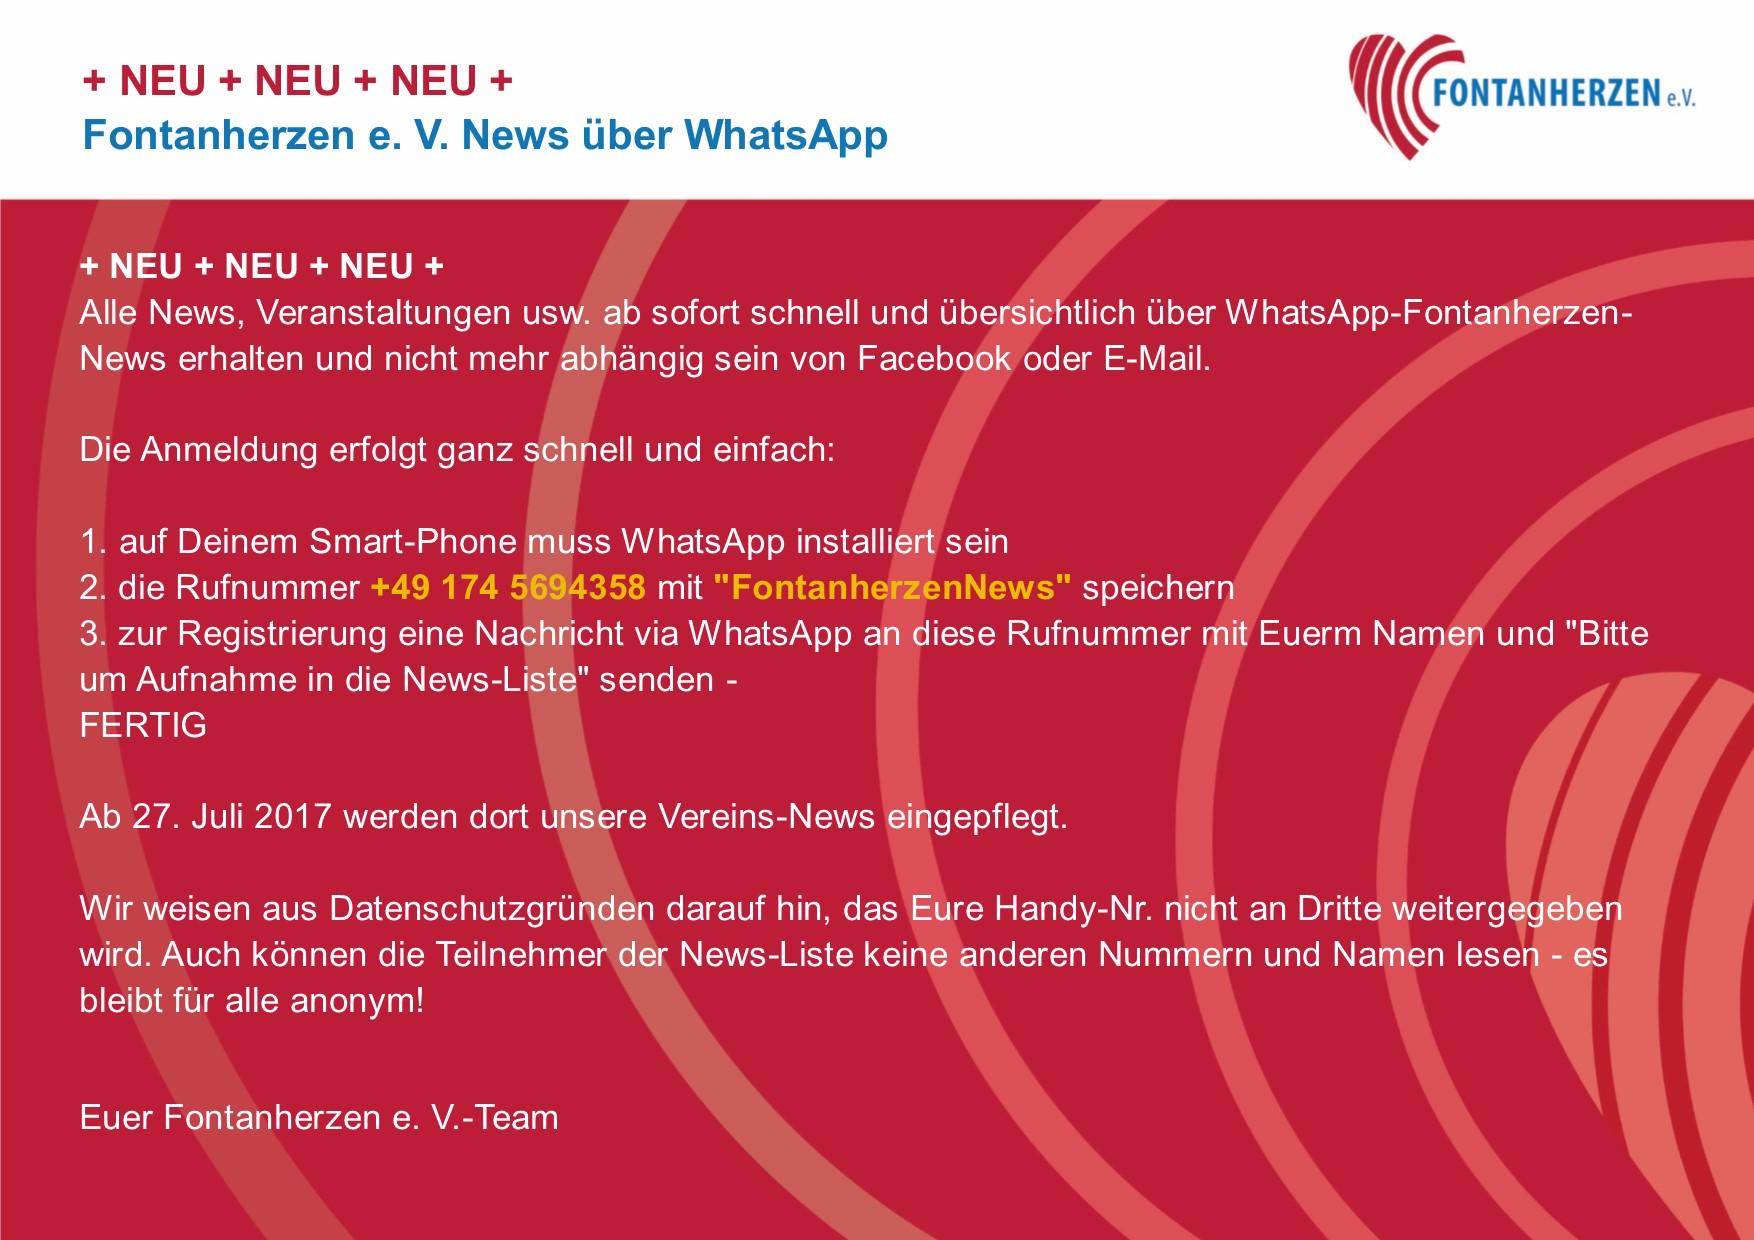 News über WhatsApp